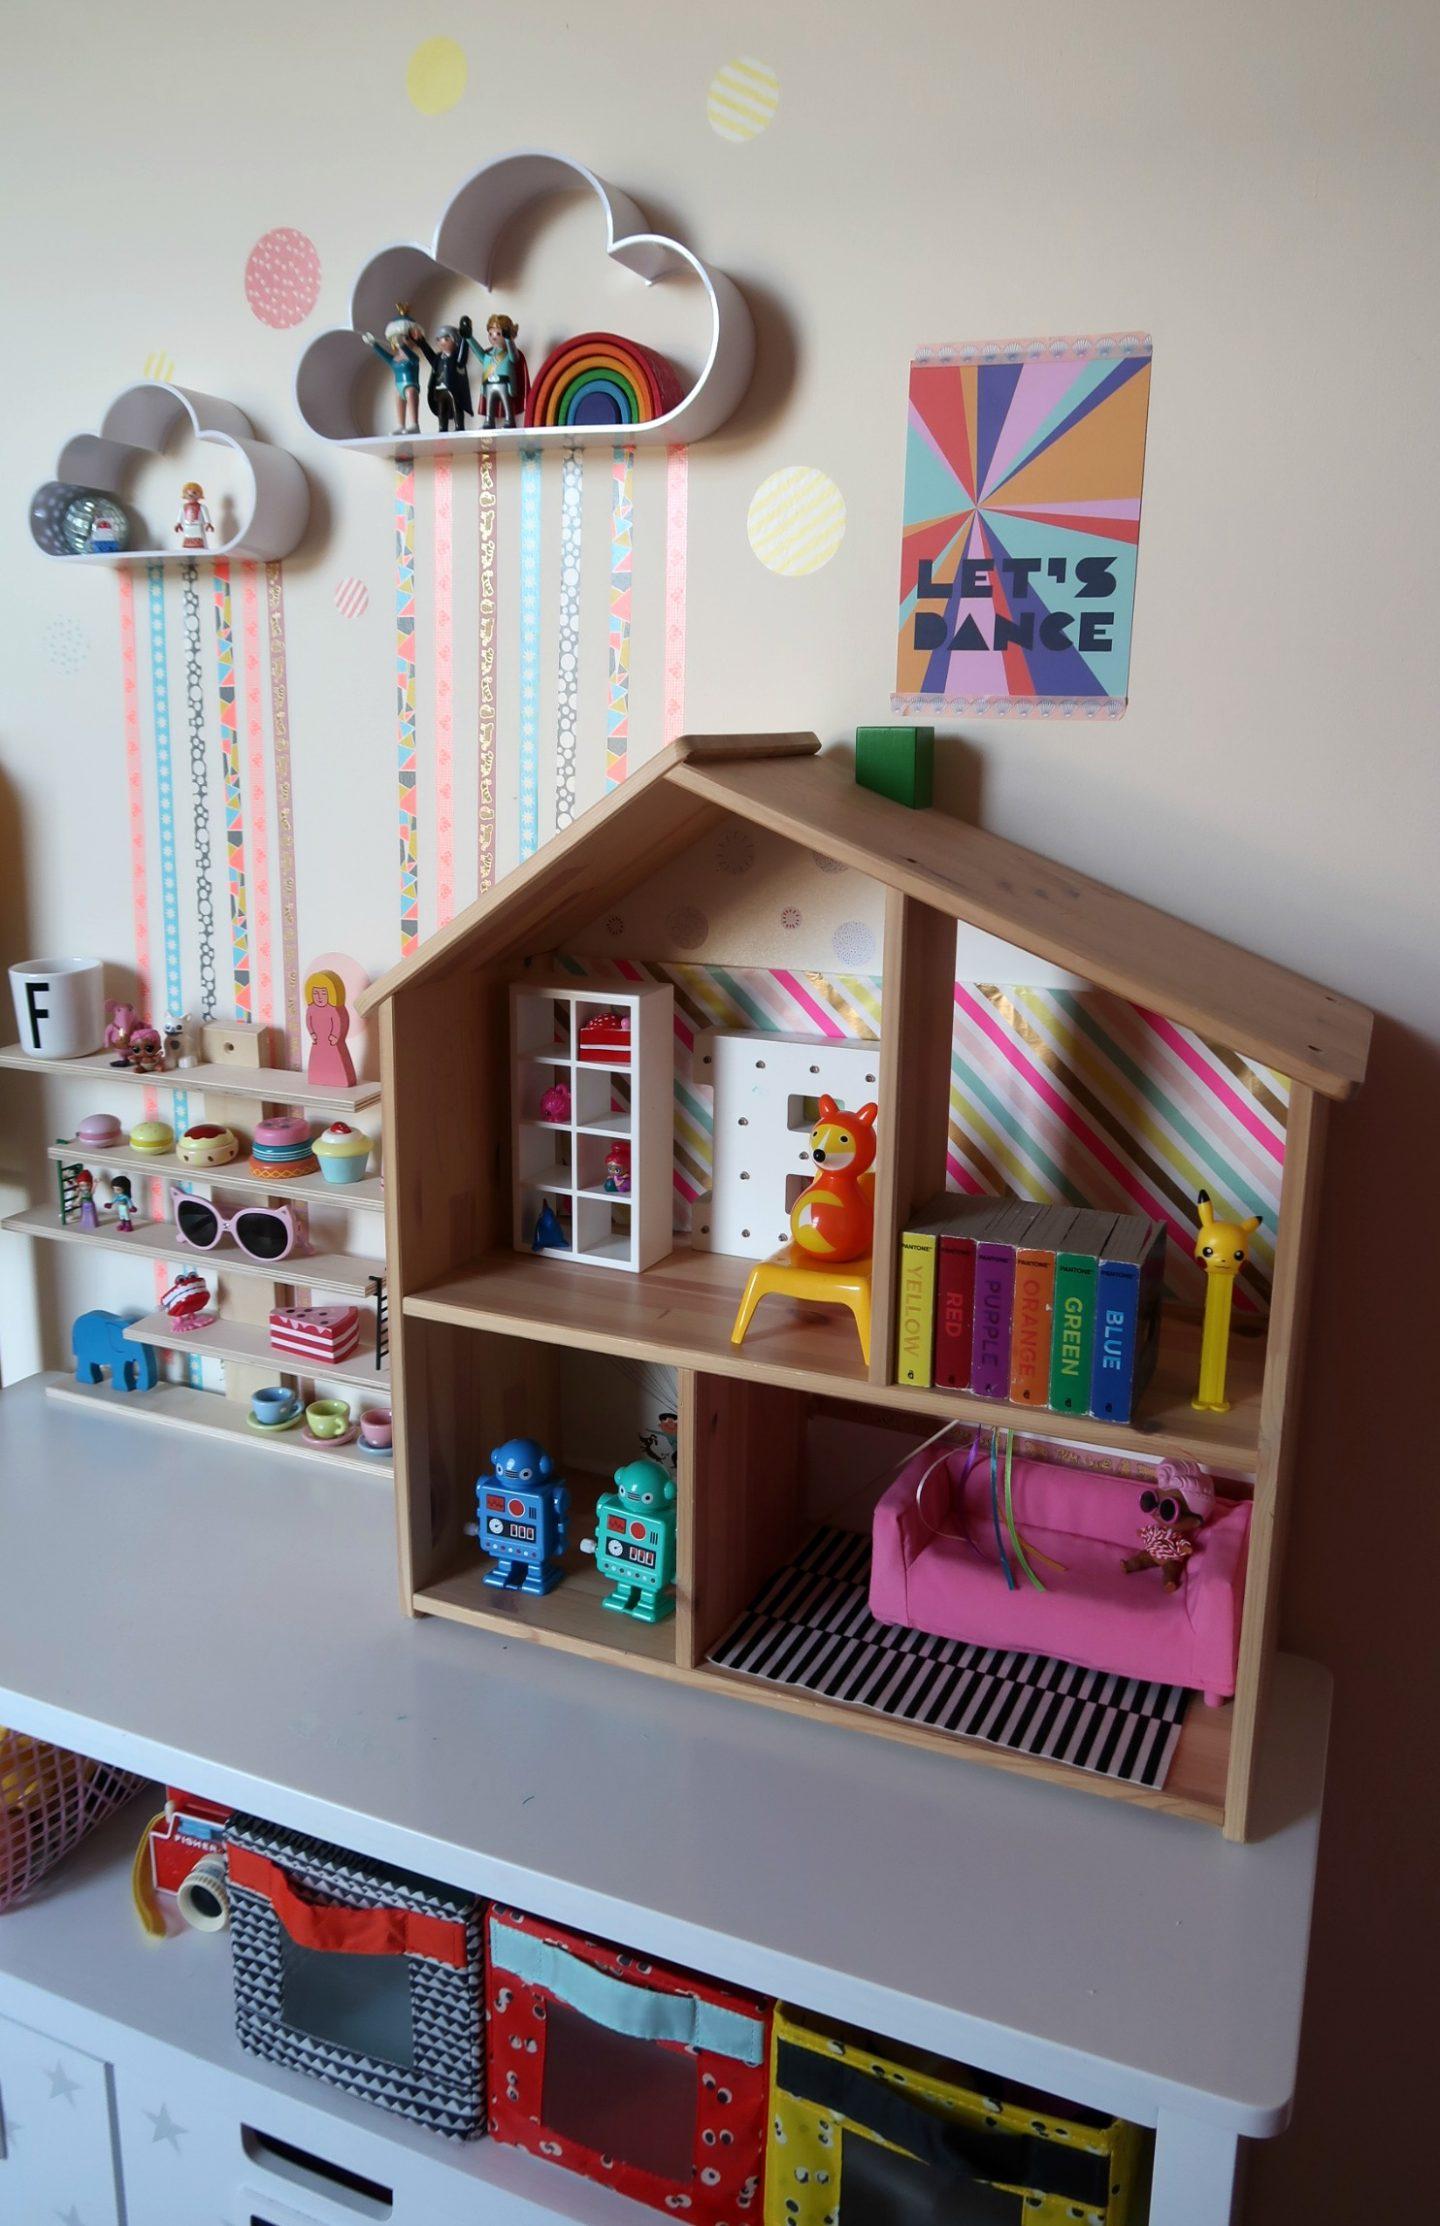 Kids room storage hacks with IKEA Flisat